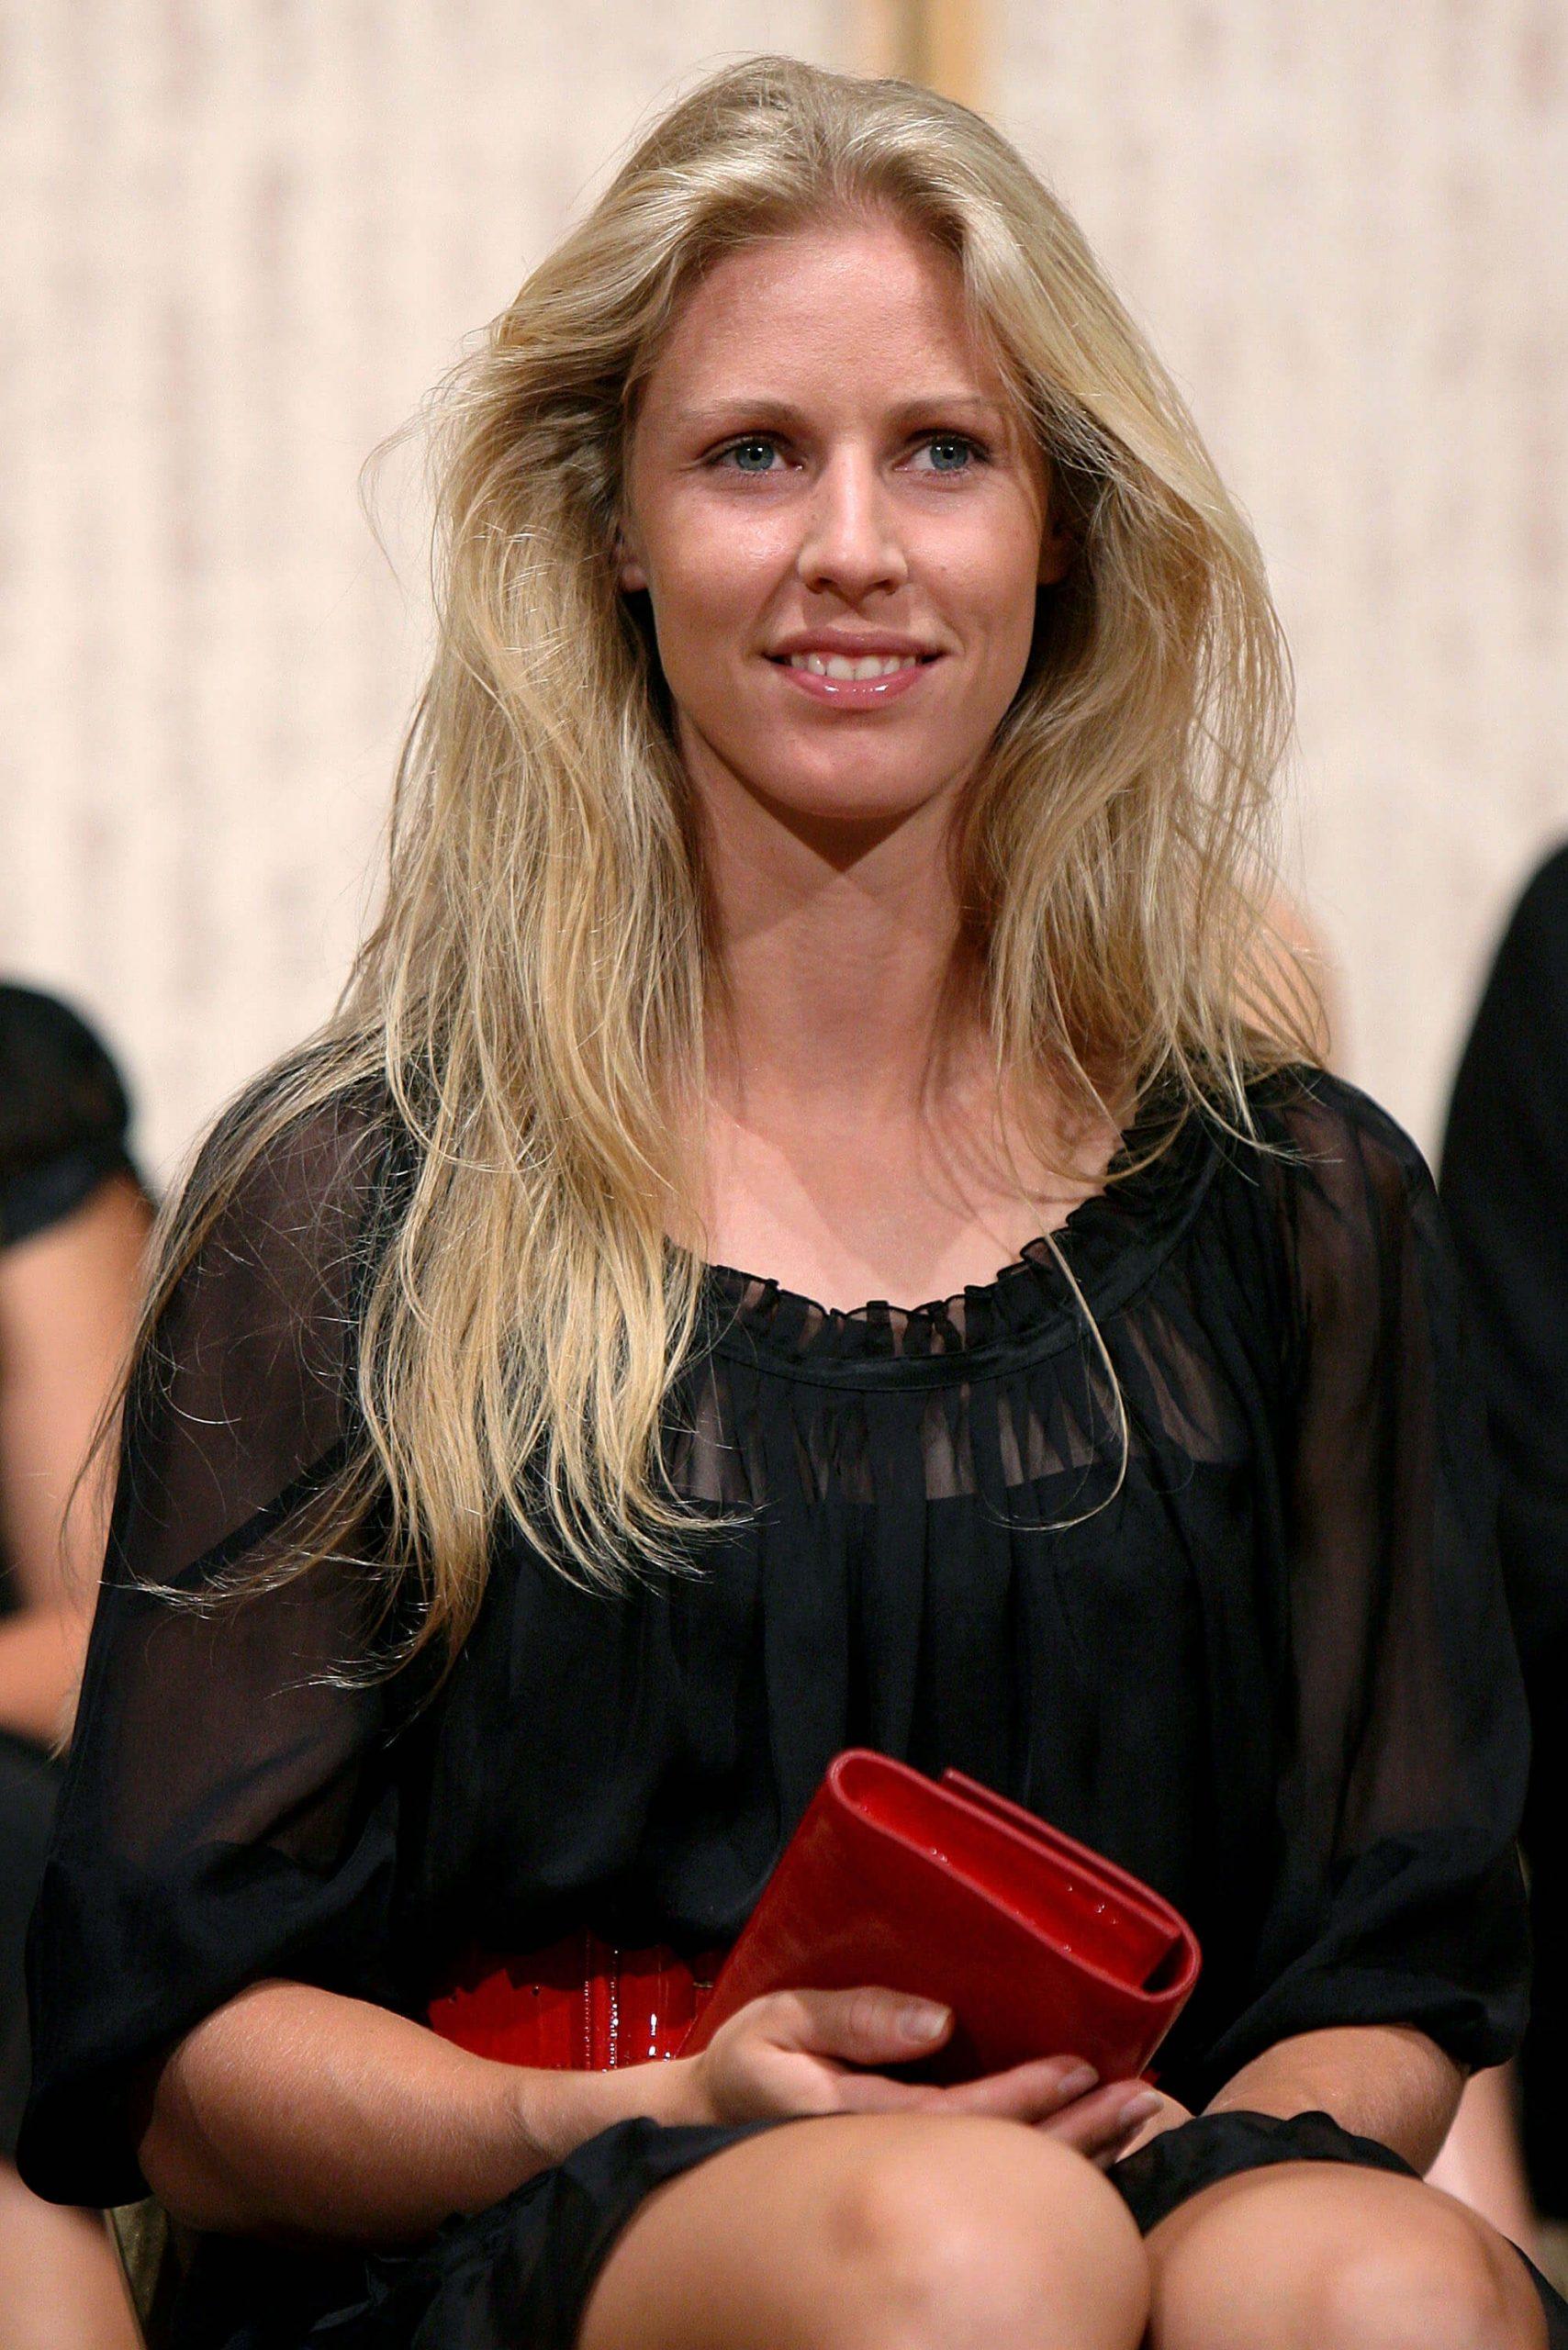 Elena Dementieva lovely smile